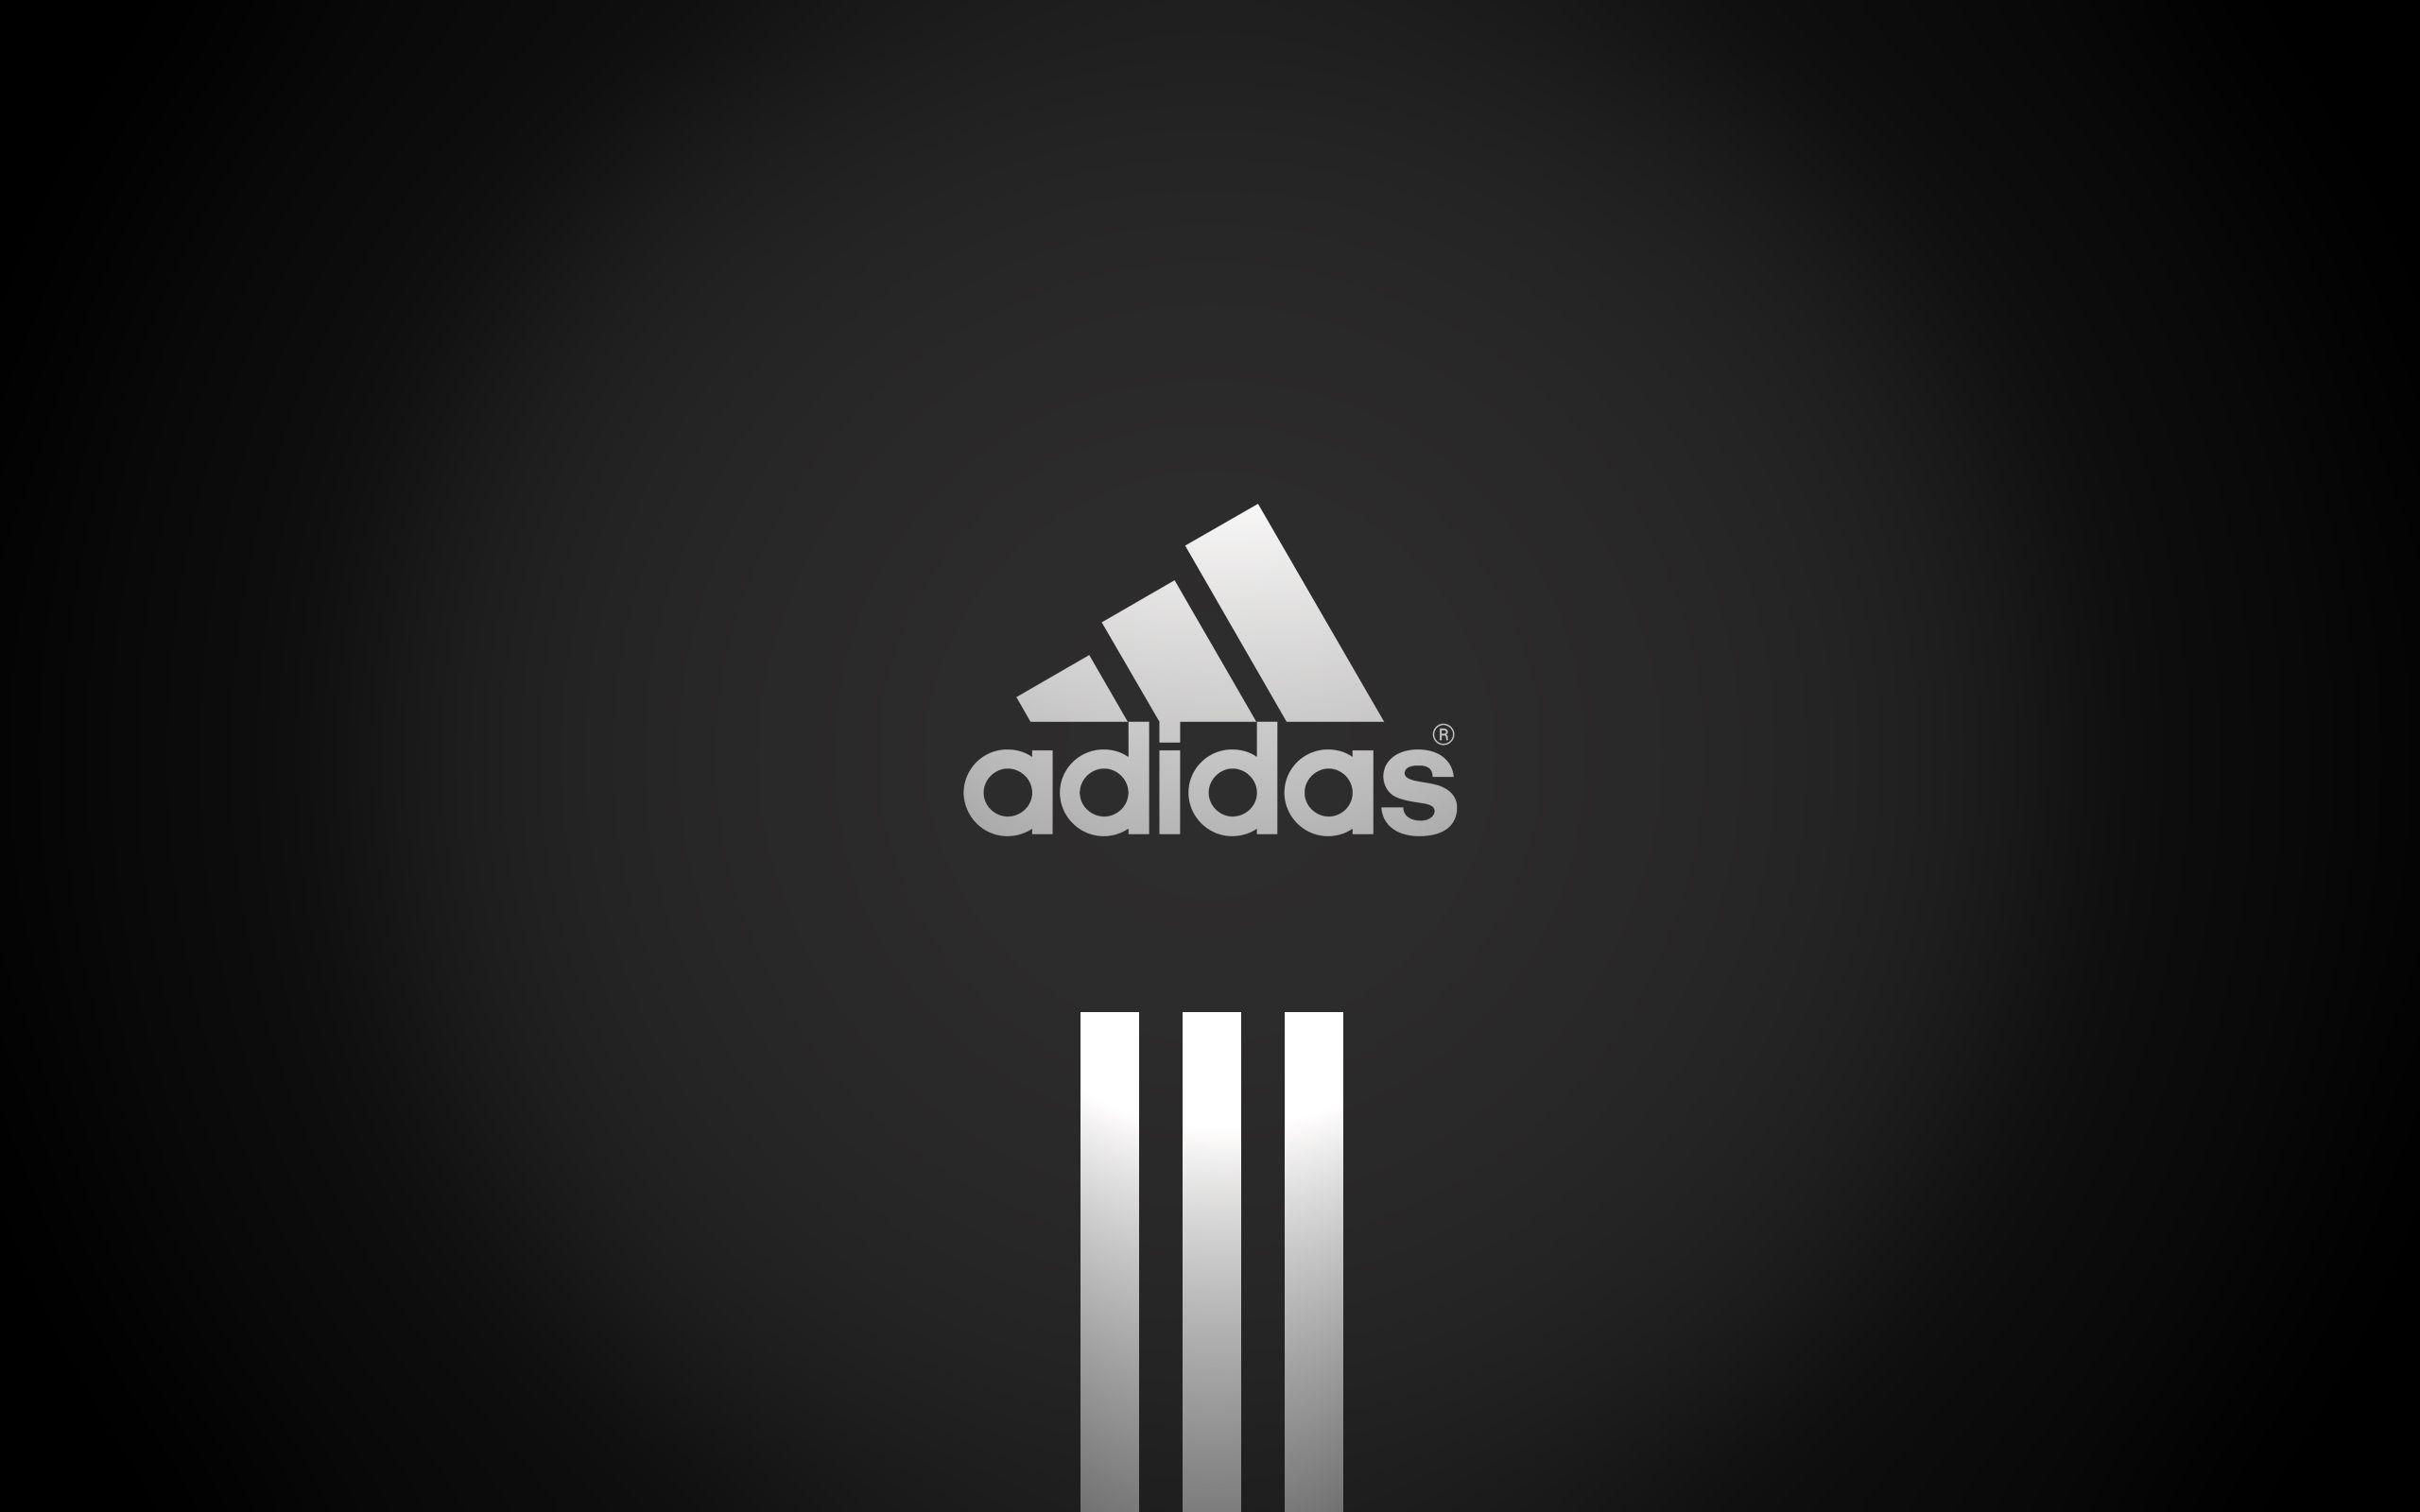 logos adidas en hd